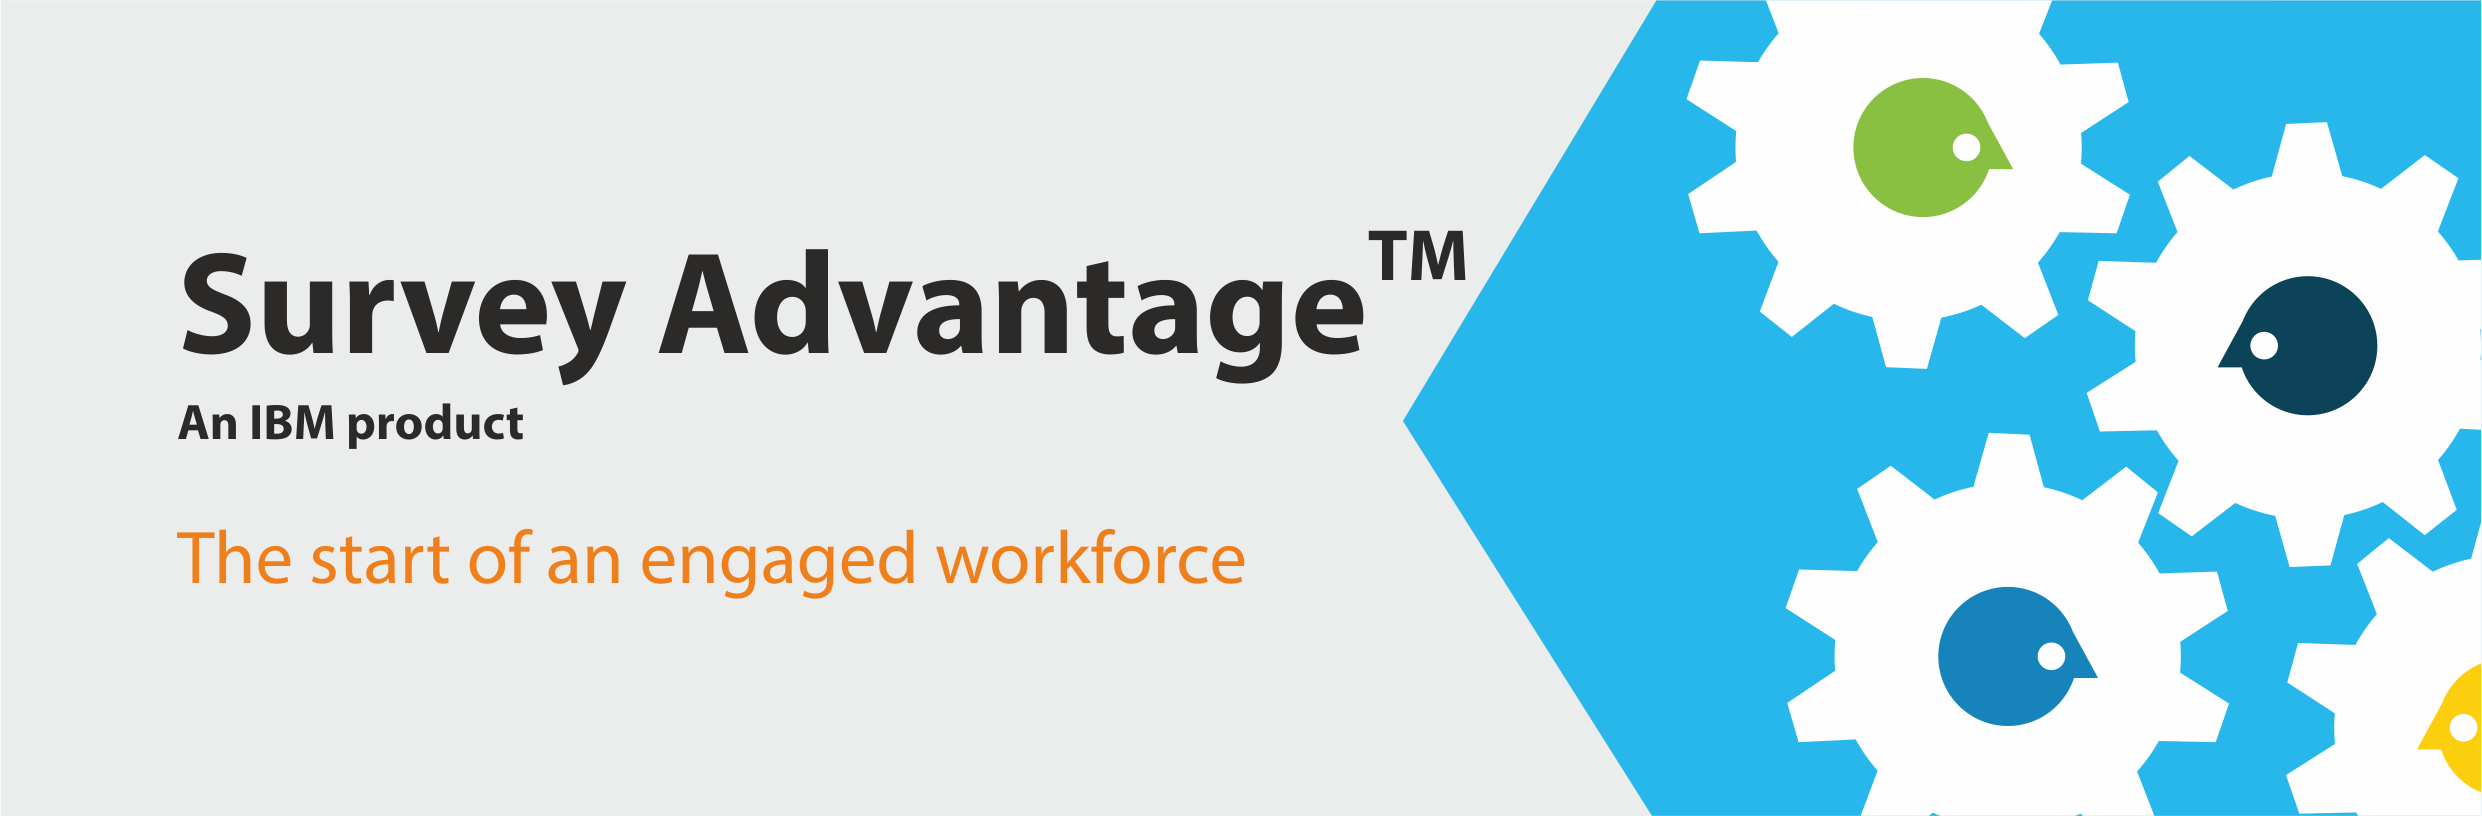 IBM survey advantage